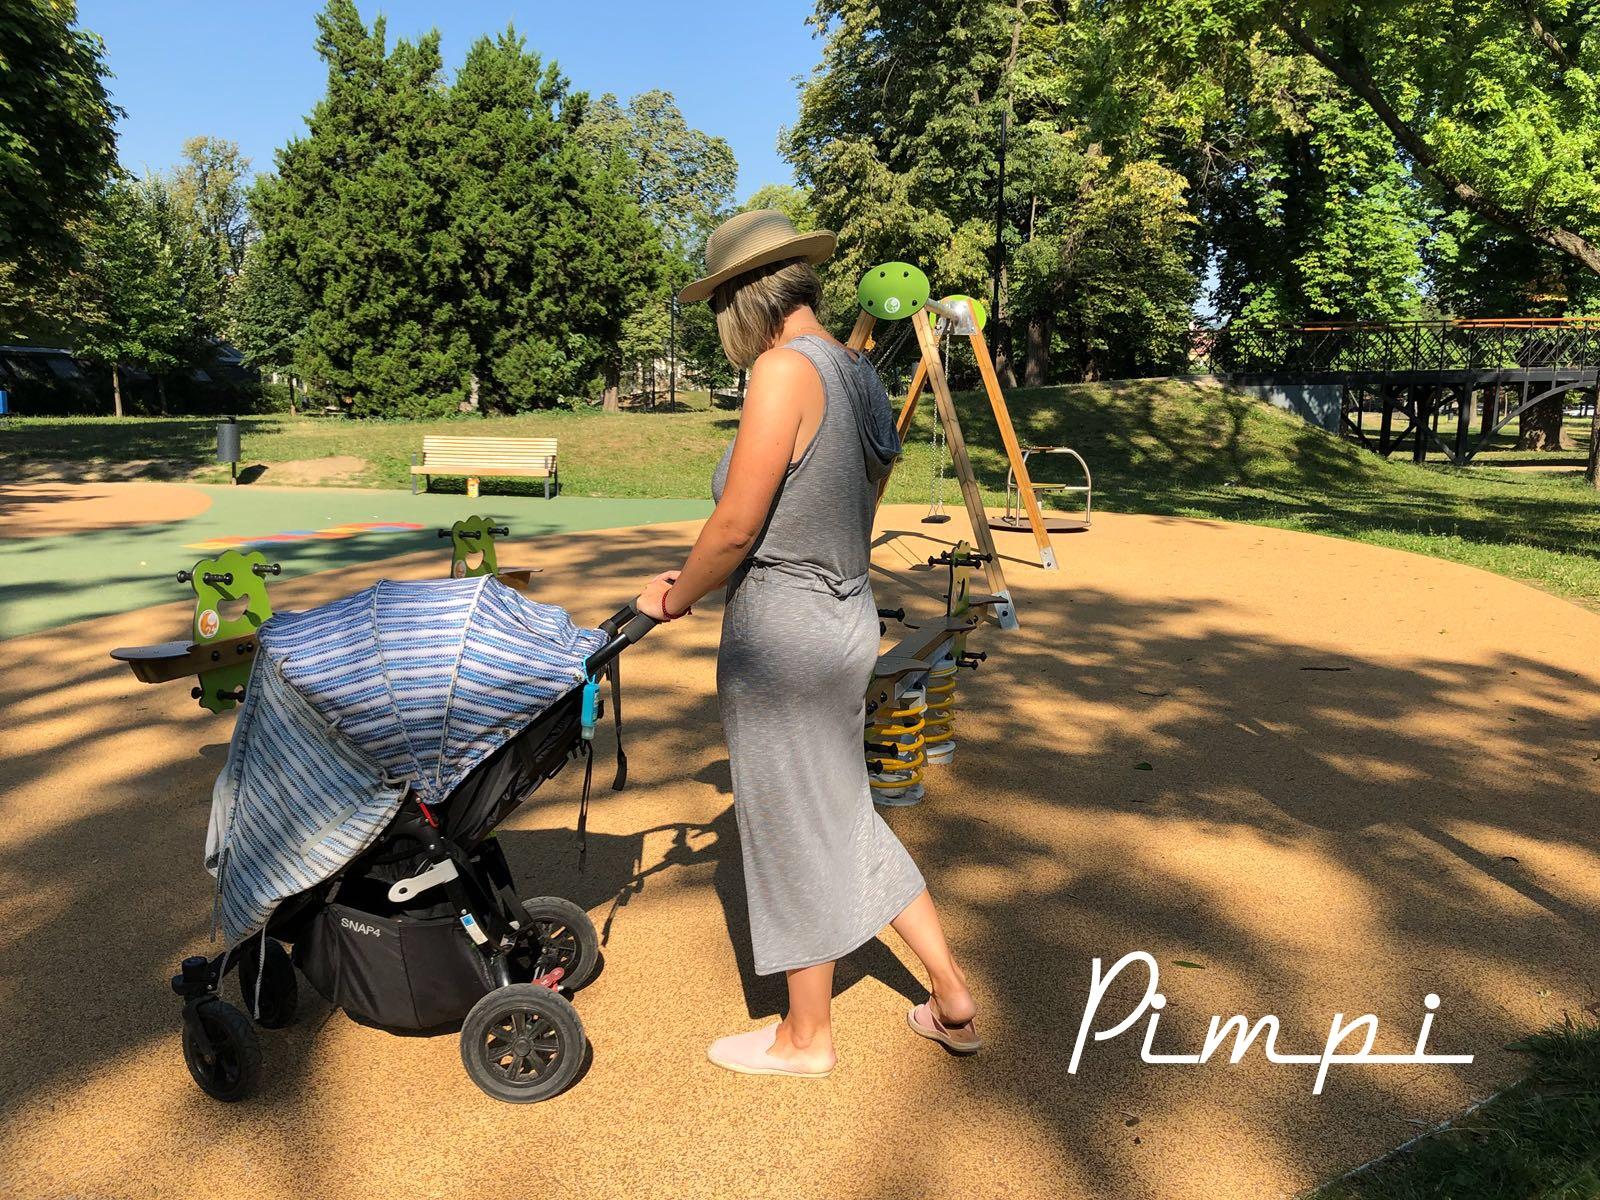 pimpi-bábo-bábätko-cestovanie-mama na cestách-cestovateľský blog-košice-detské ihrisko-nové-top-outfit-ihriskový outfit-bonprix-dnes nosím-značky bonprix